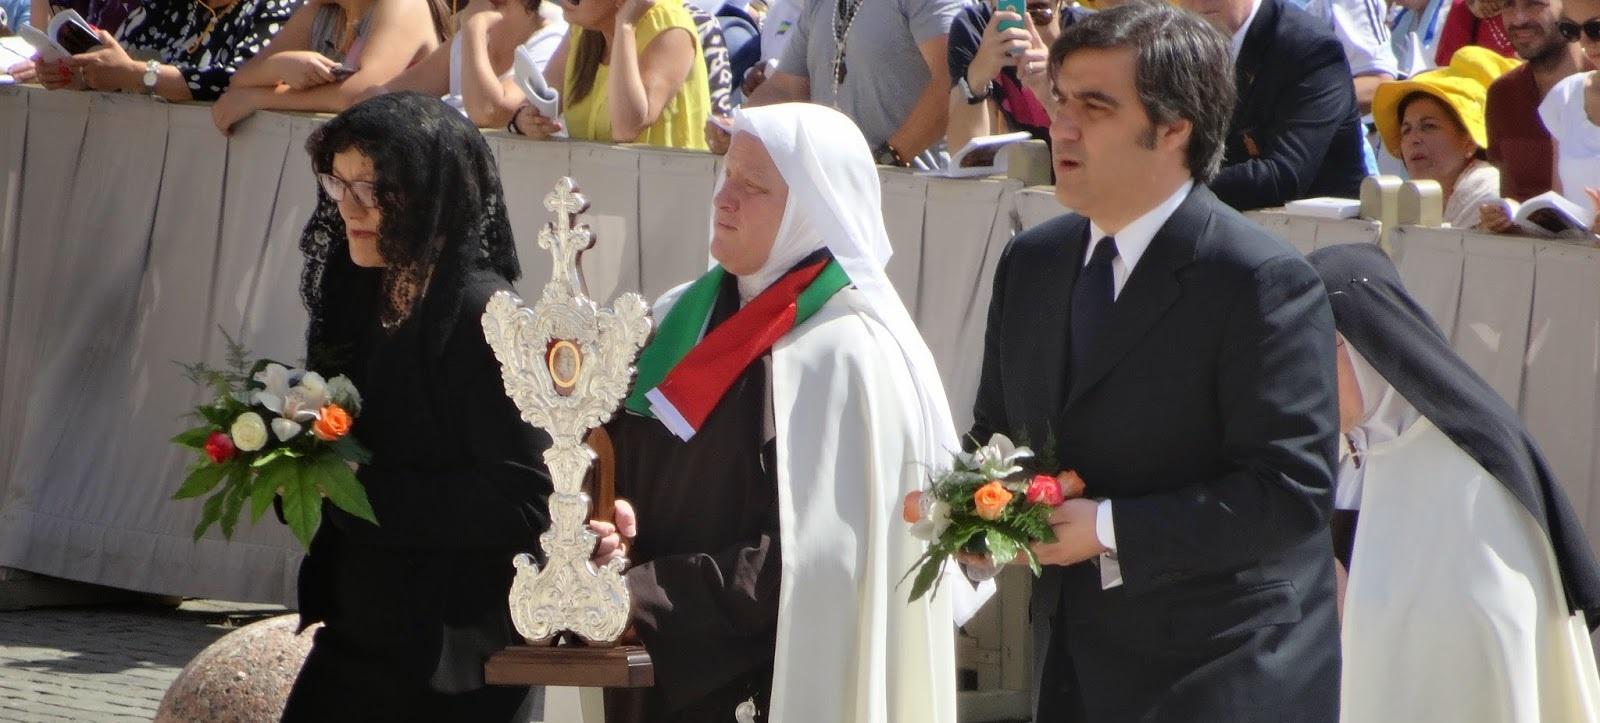 Dos monjas árabes de Palestina son canonizadas por el papa Francisco